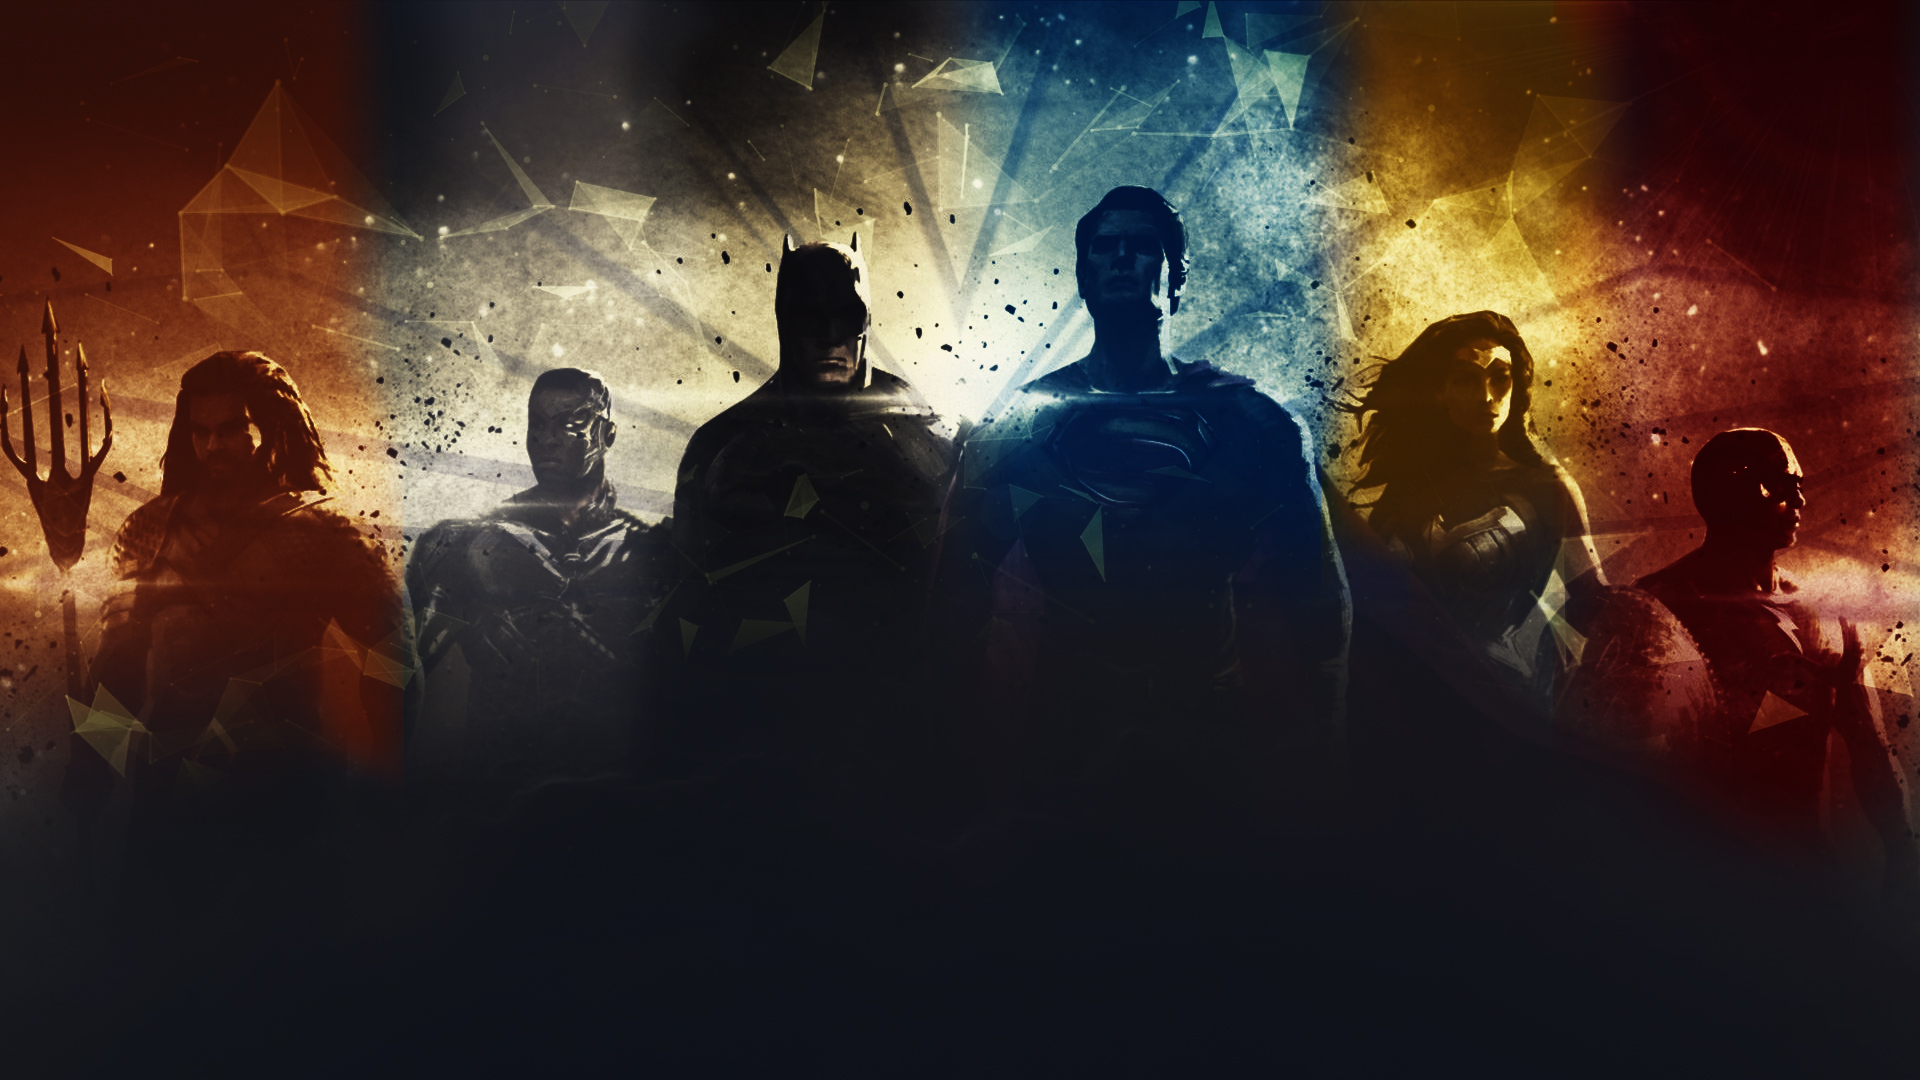 szmk_justice_league_igazsag_ligaja_batman_superman_dc_danny_elfman.jpg